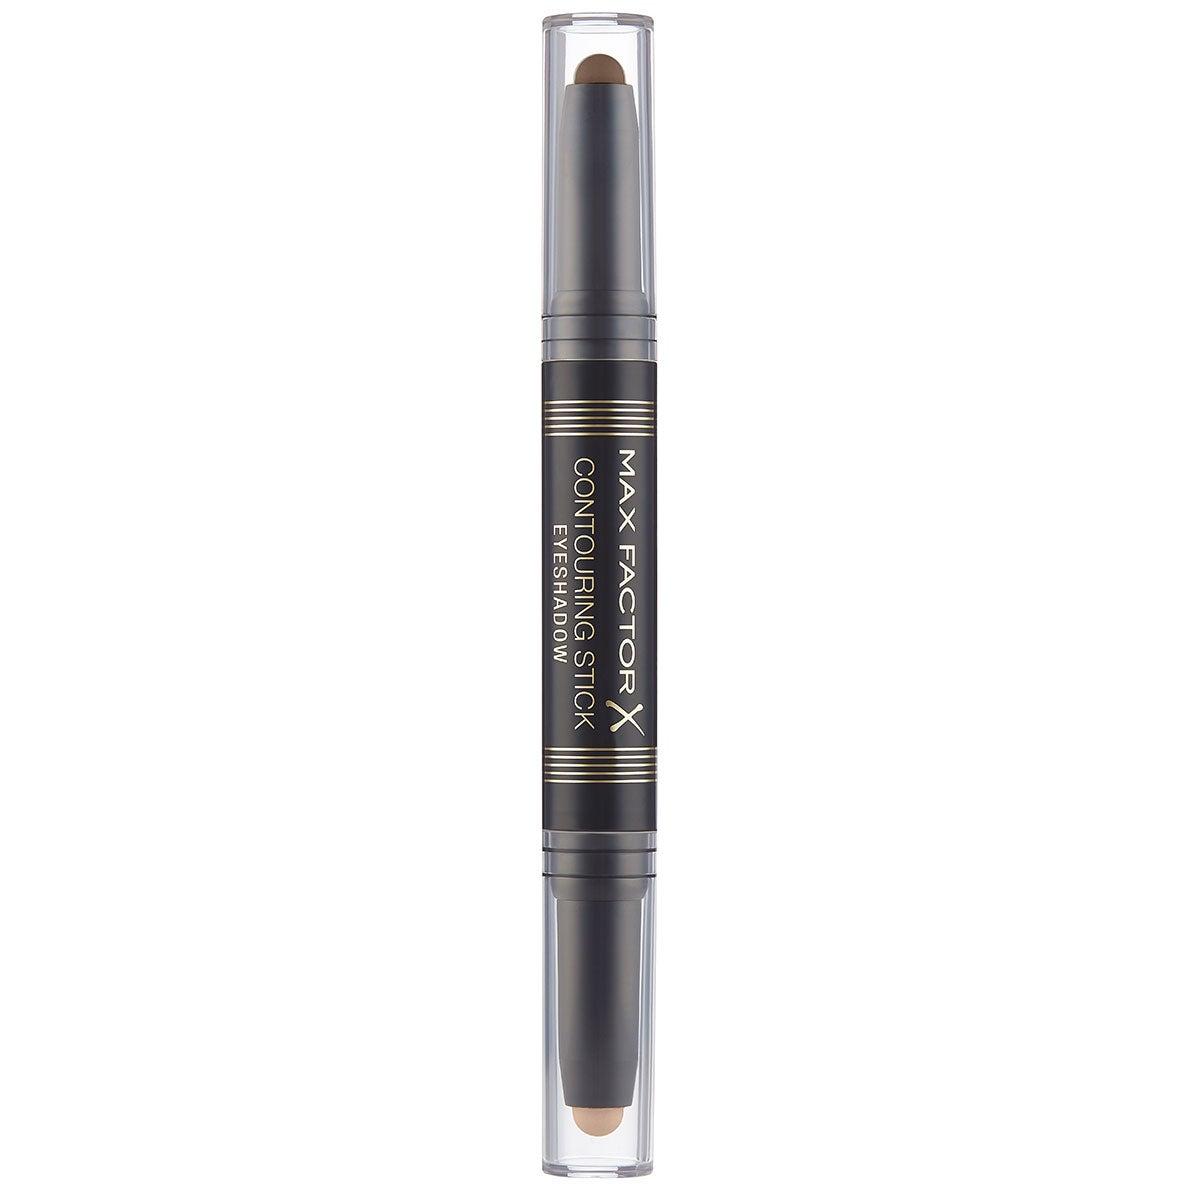 Contour Stick Eyeshadow 1 ml Max Factor Ögonskugga